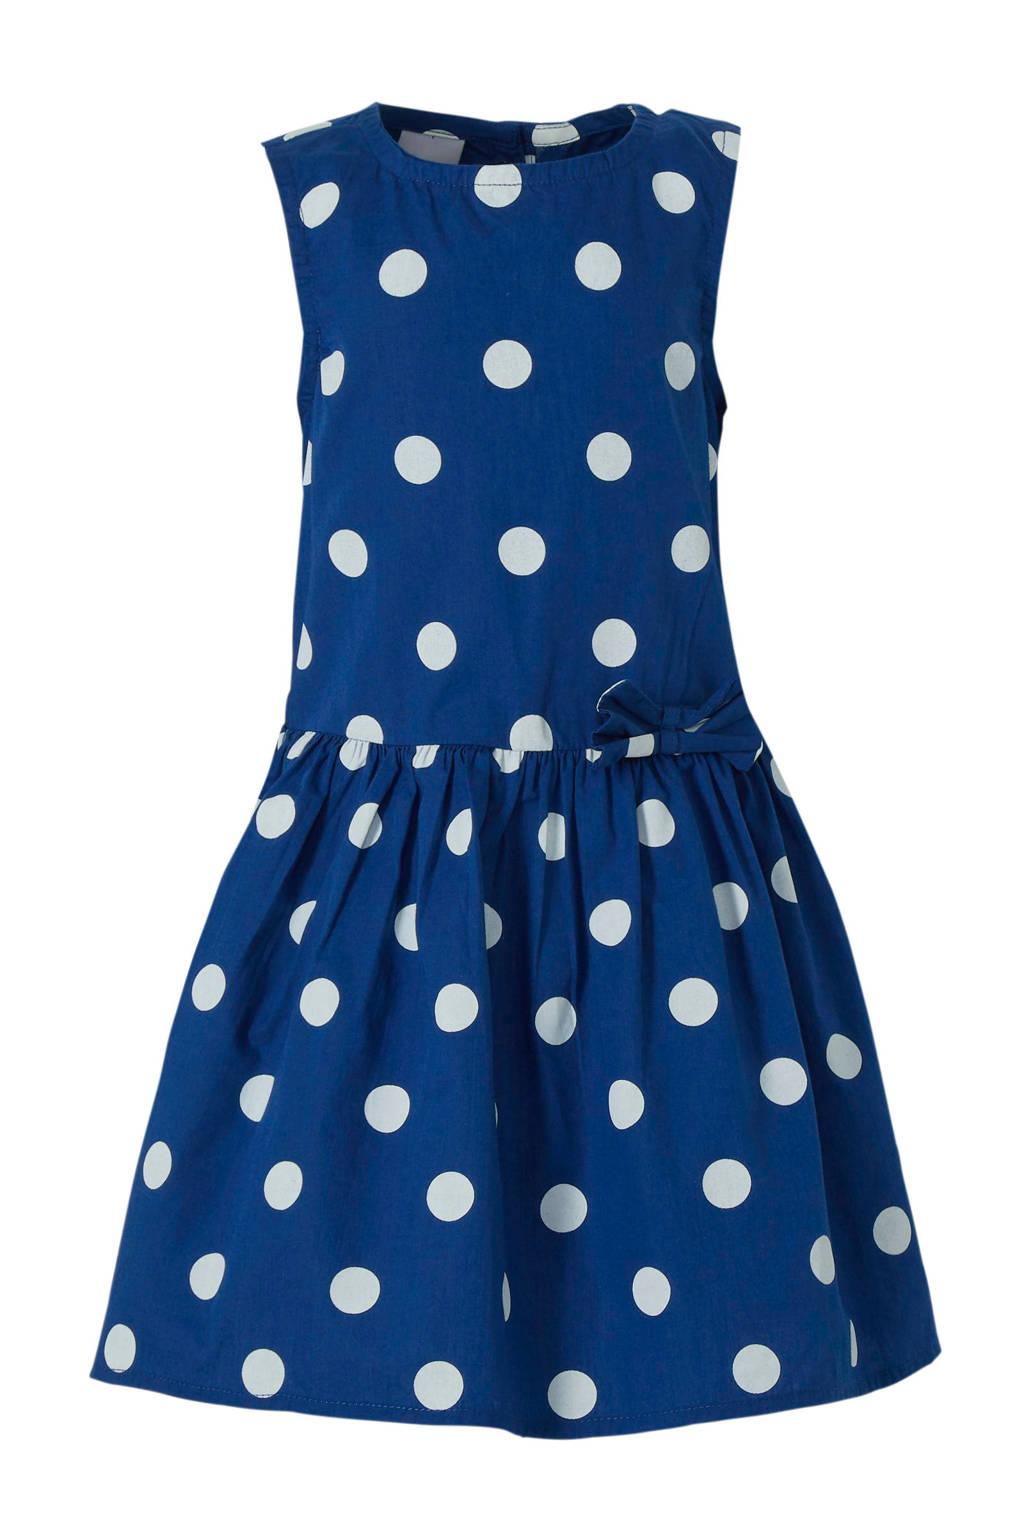 C&A Palomino jurk met stippen blauw, Blauw/wit